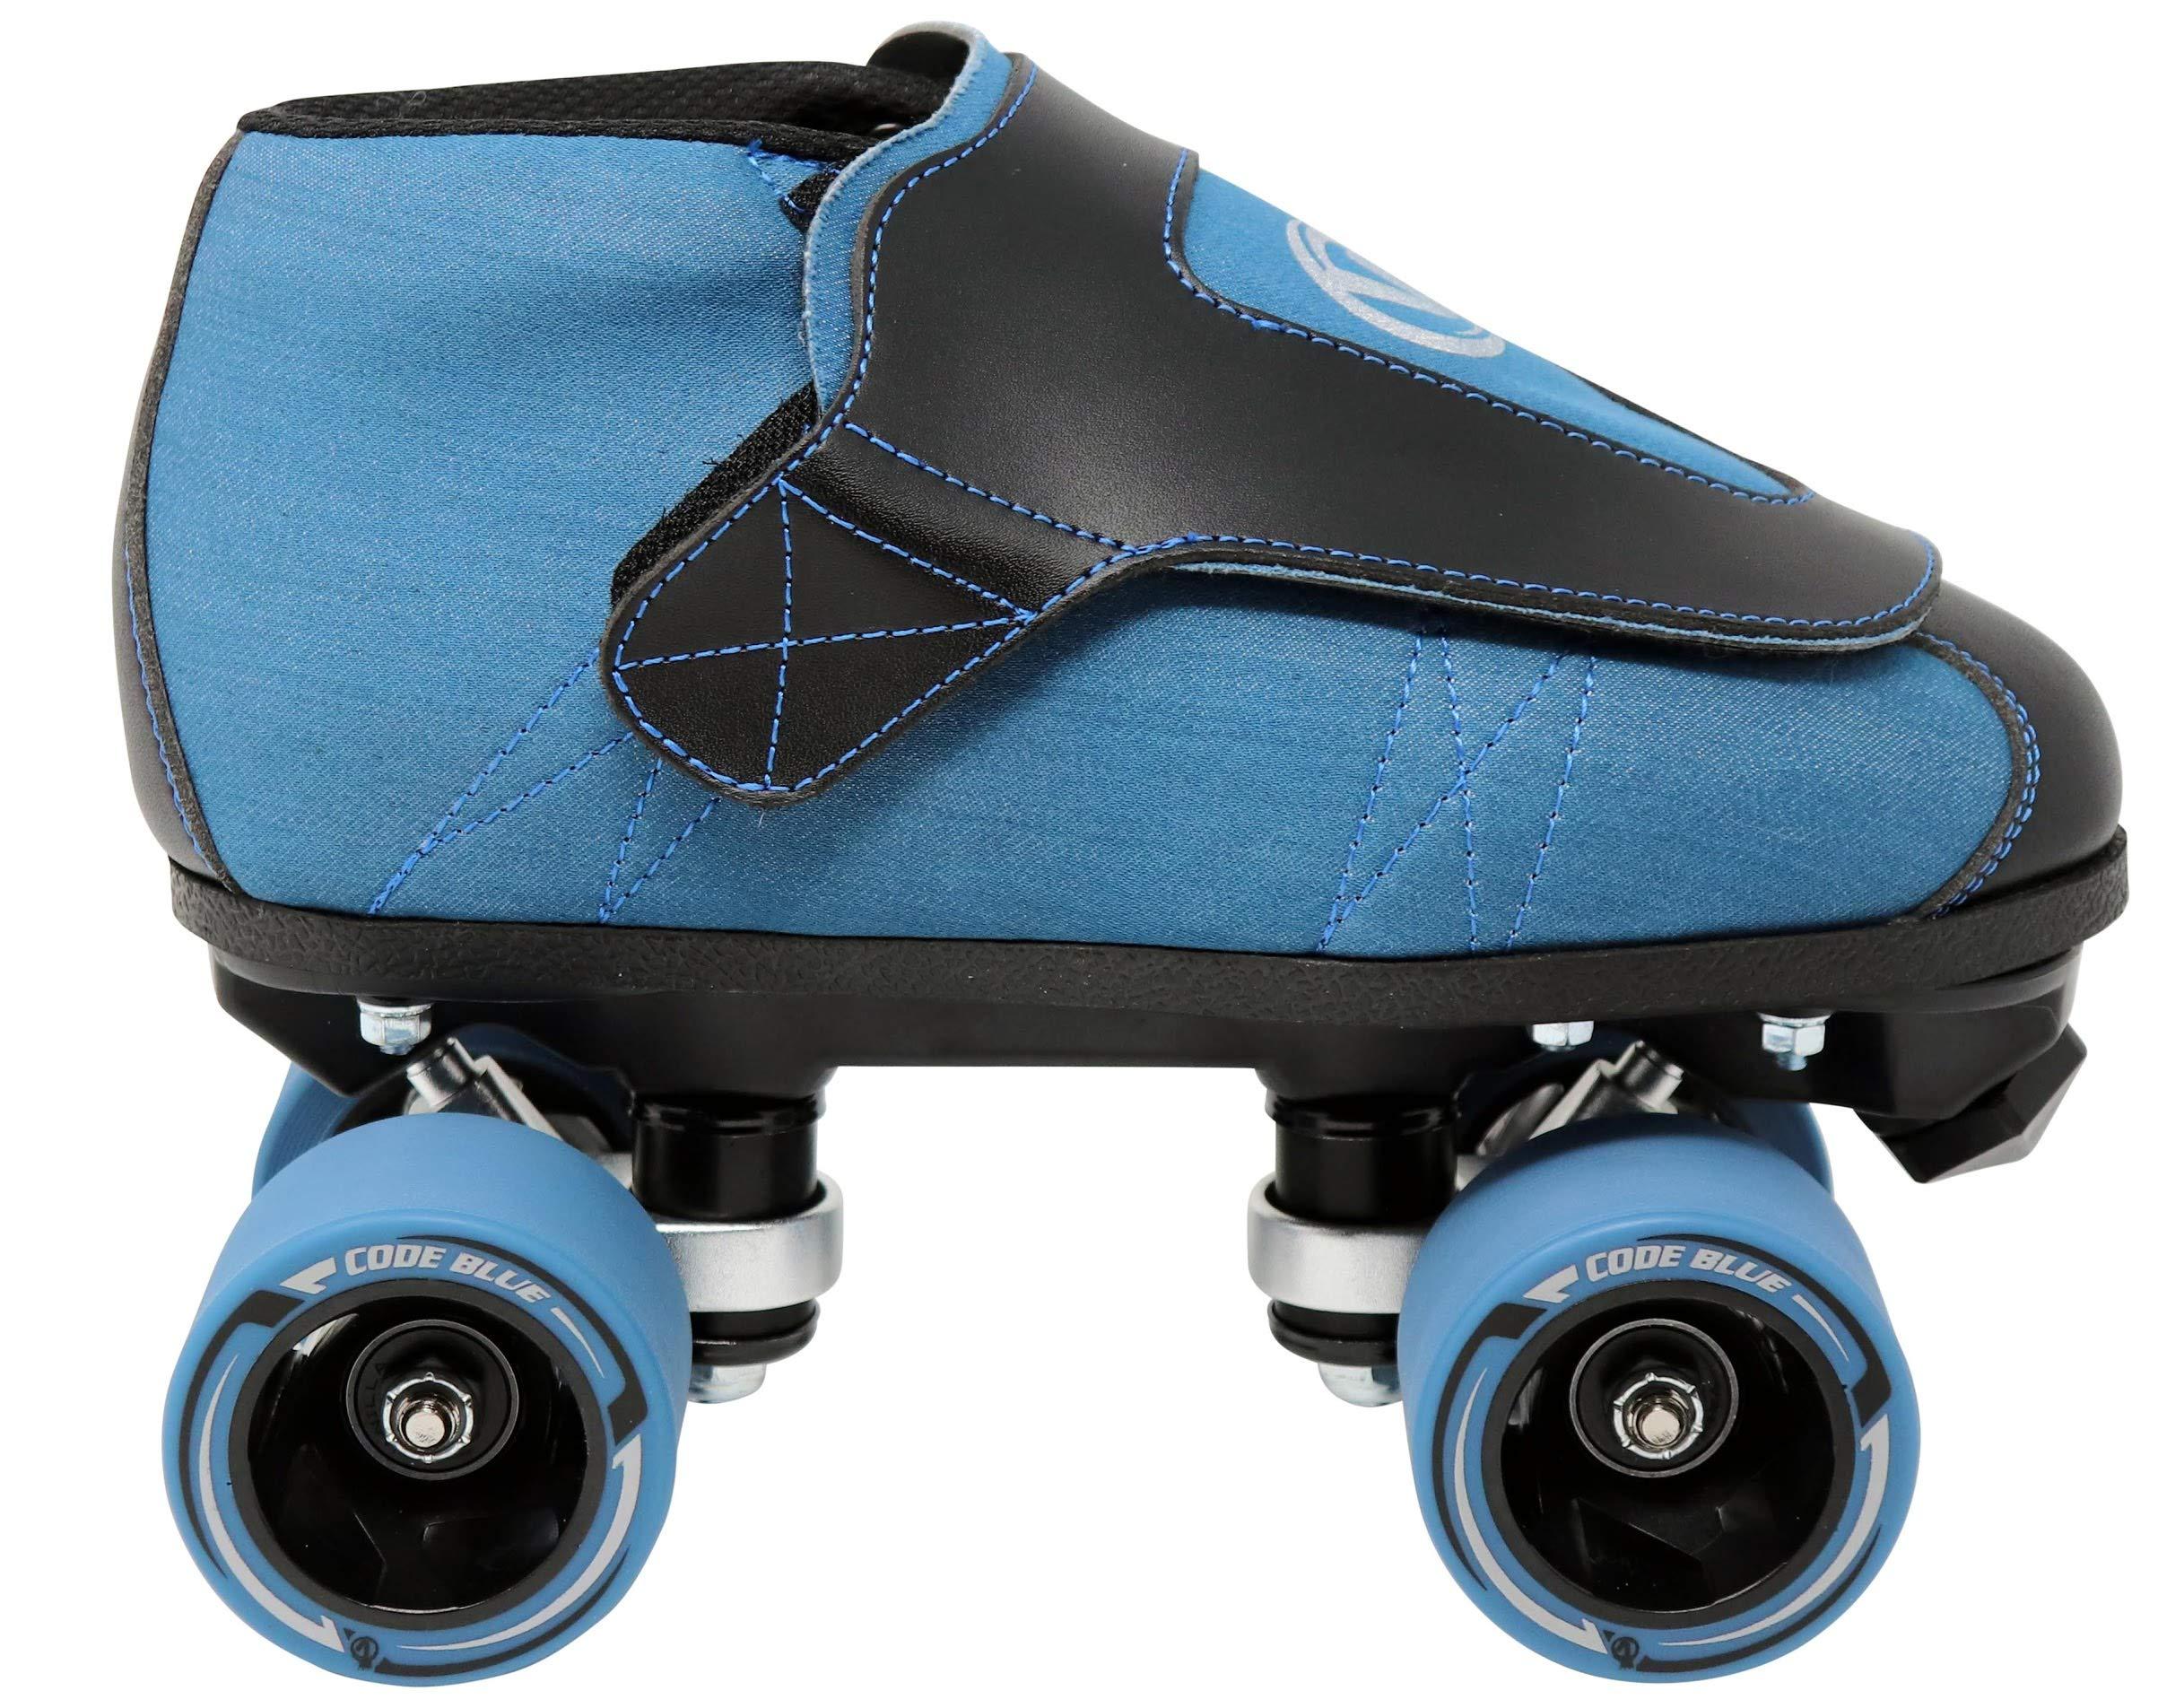 VNLA Code Blue Jam Skate - Mens & Womens Speed Skates - Quad Skates for Women & Men - Adjustable Roller Skate/Rollerskates - Outdoor & Indoor Adult Quad Skate - Kid/Kids Roller Skates (Size 8) by VNLA (Image #2)